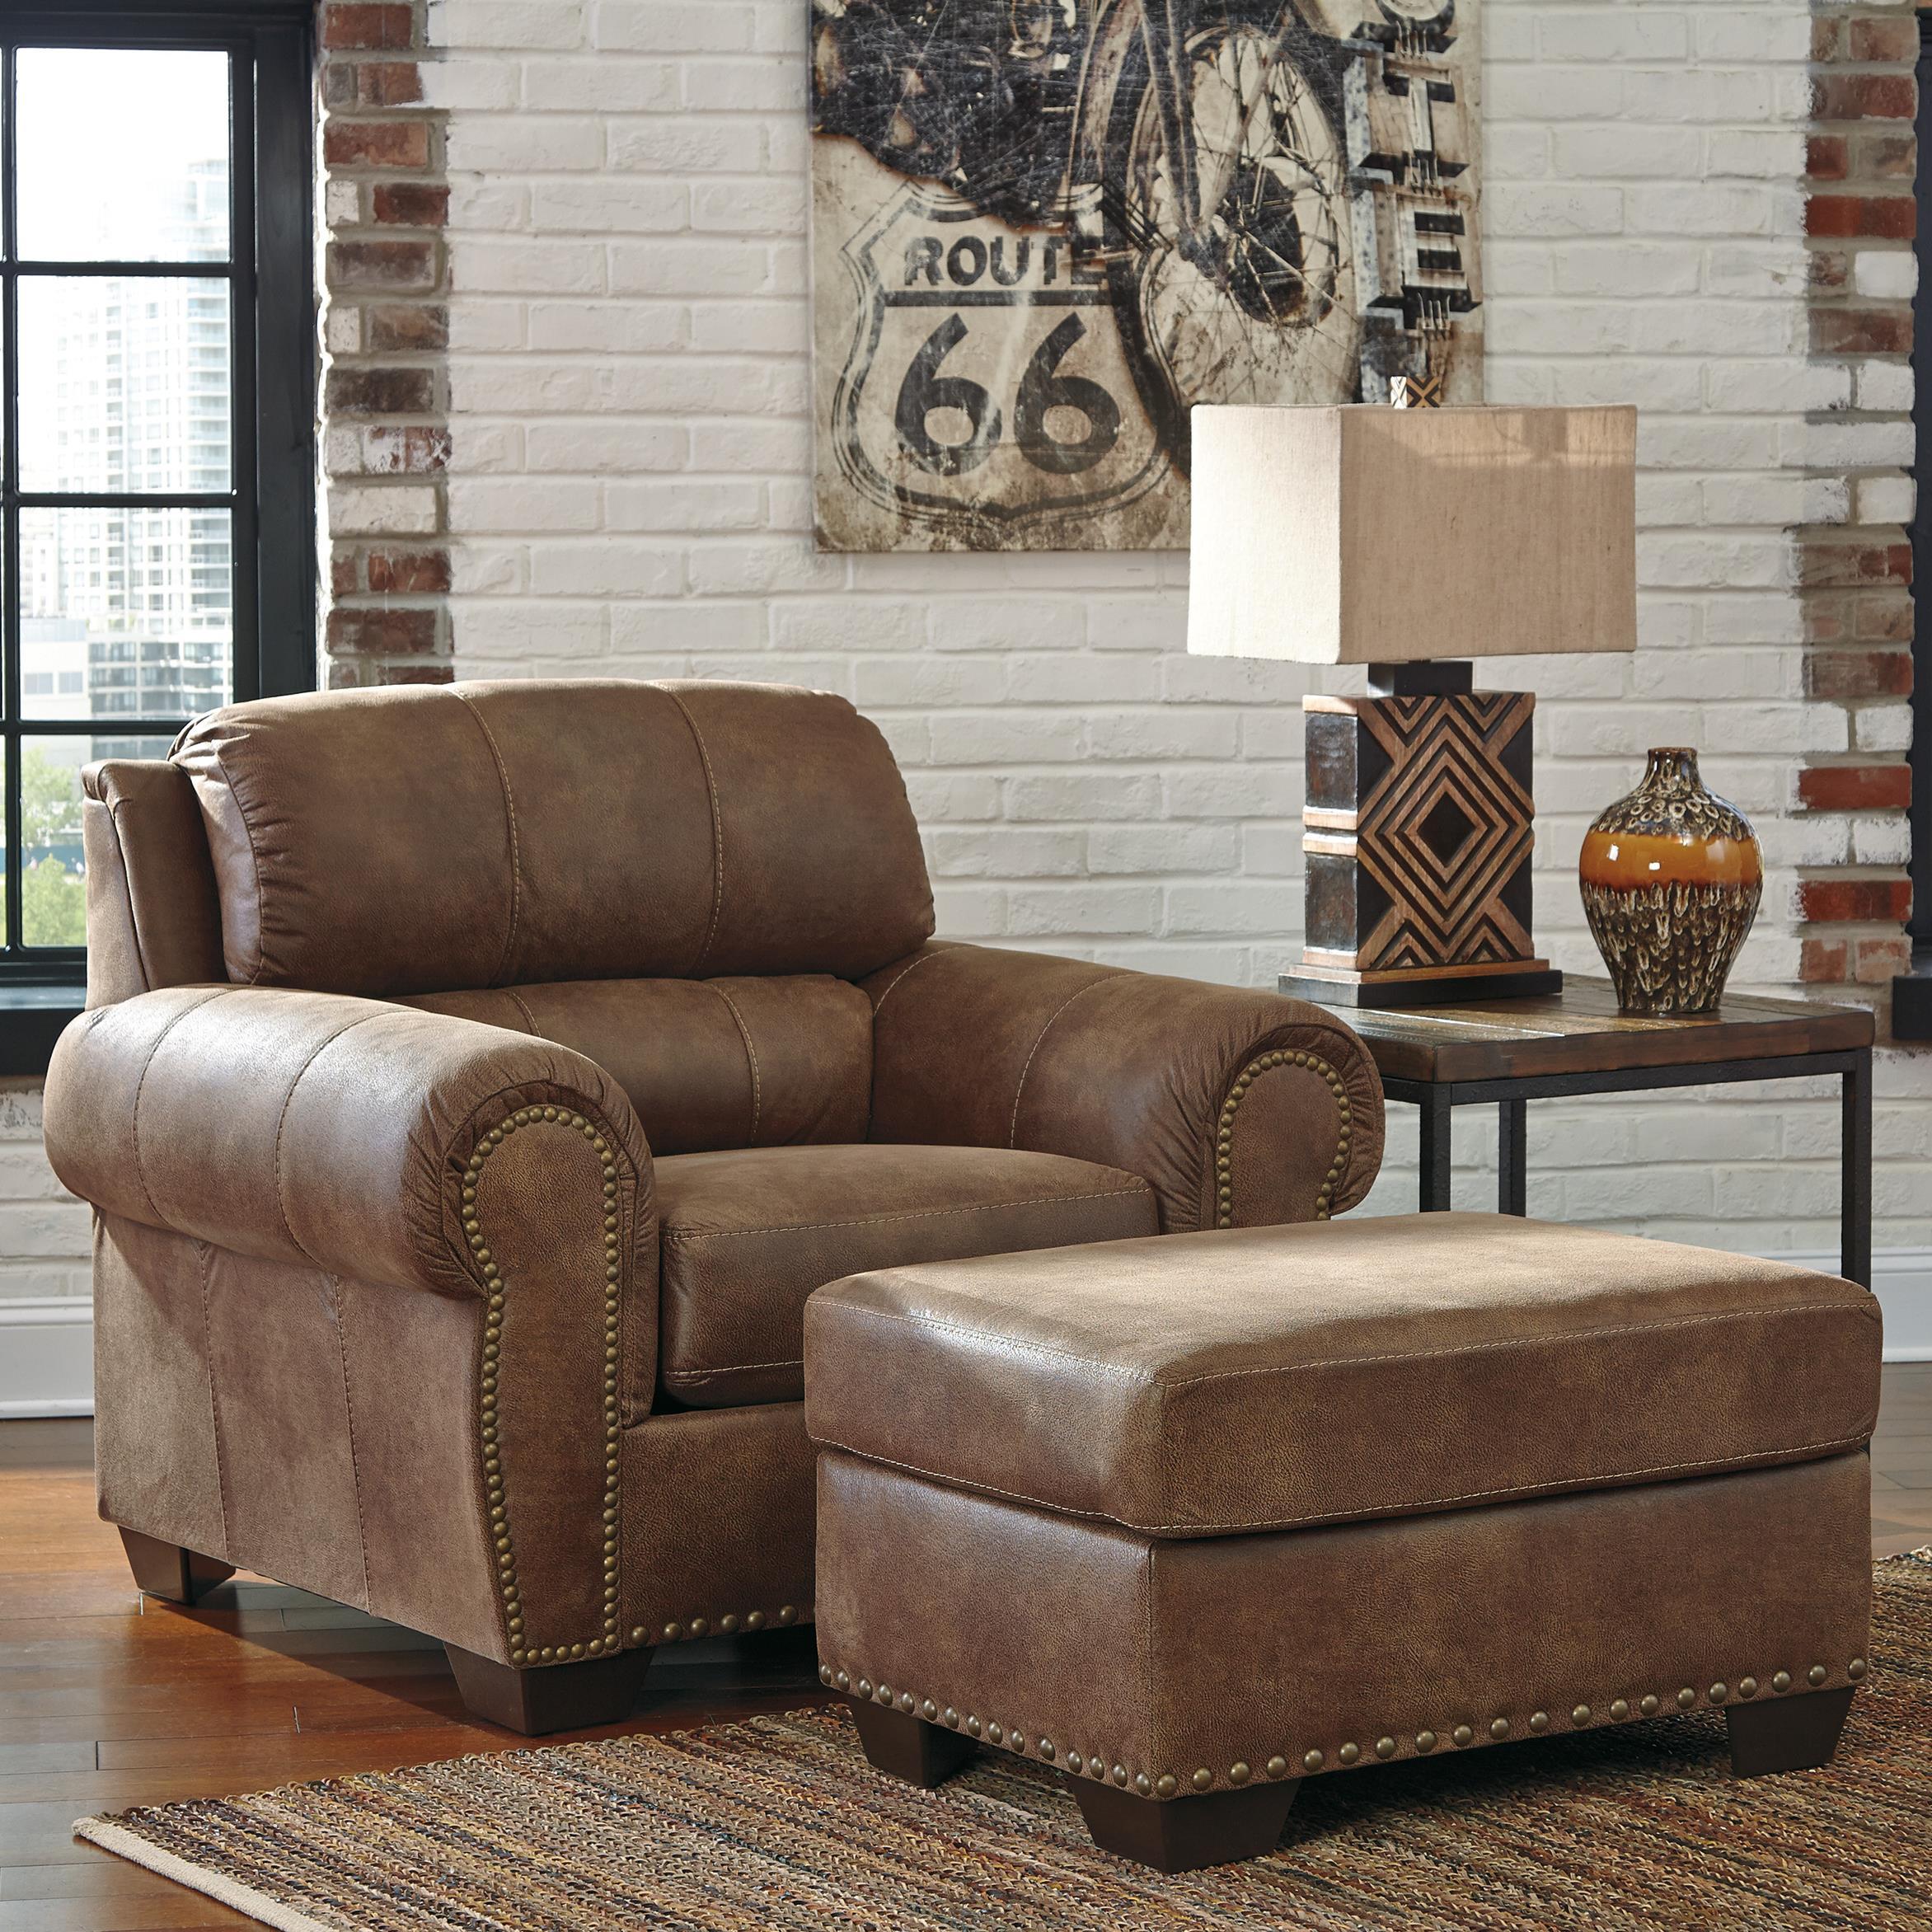 Becker Furniture Burnsville